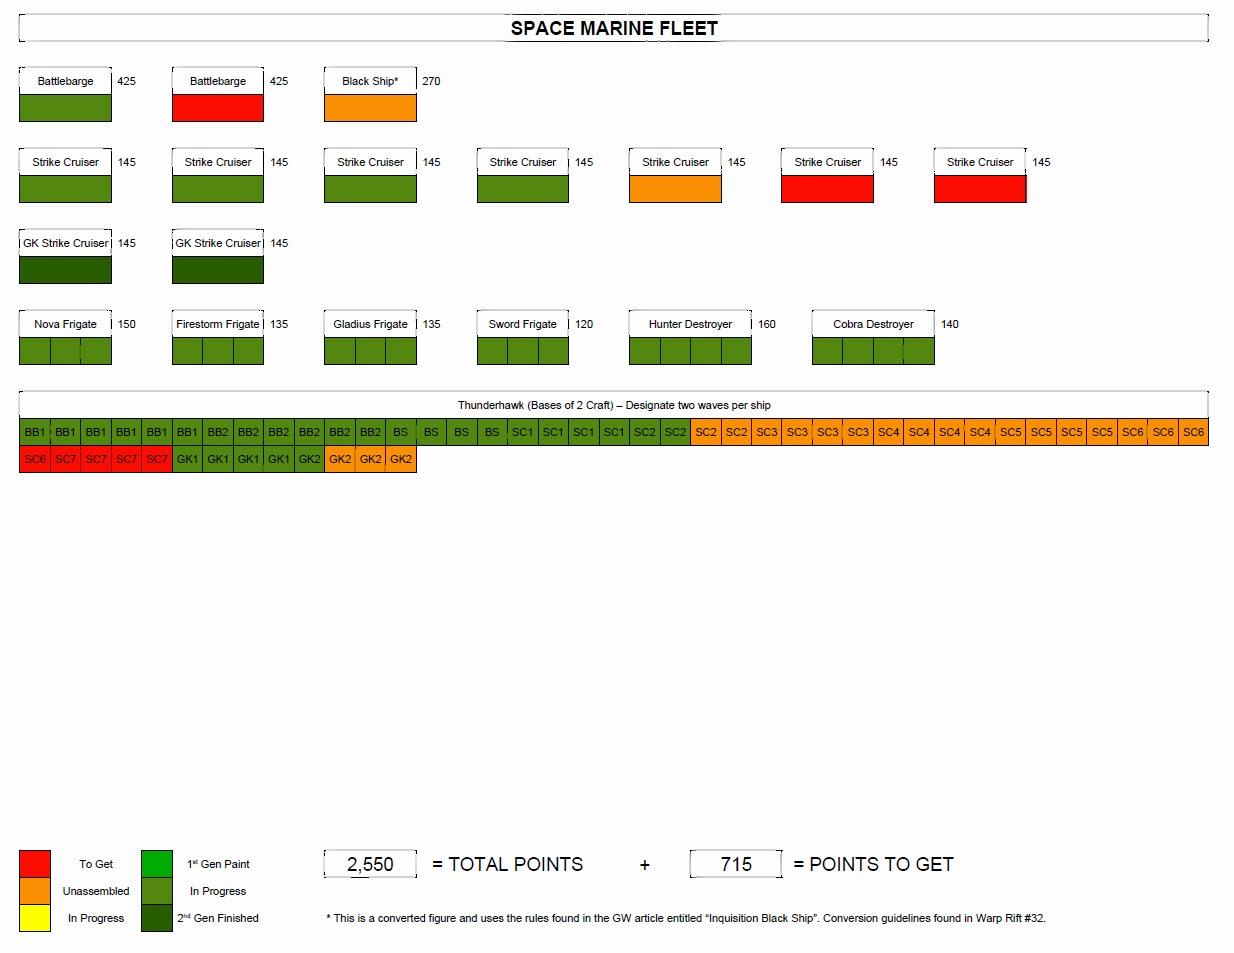 zorcon u0026 39 s word  bfg progress charts